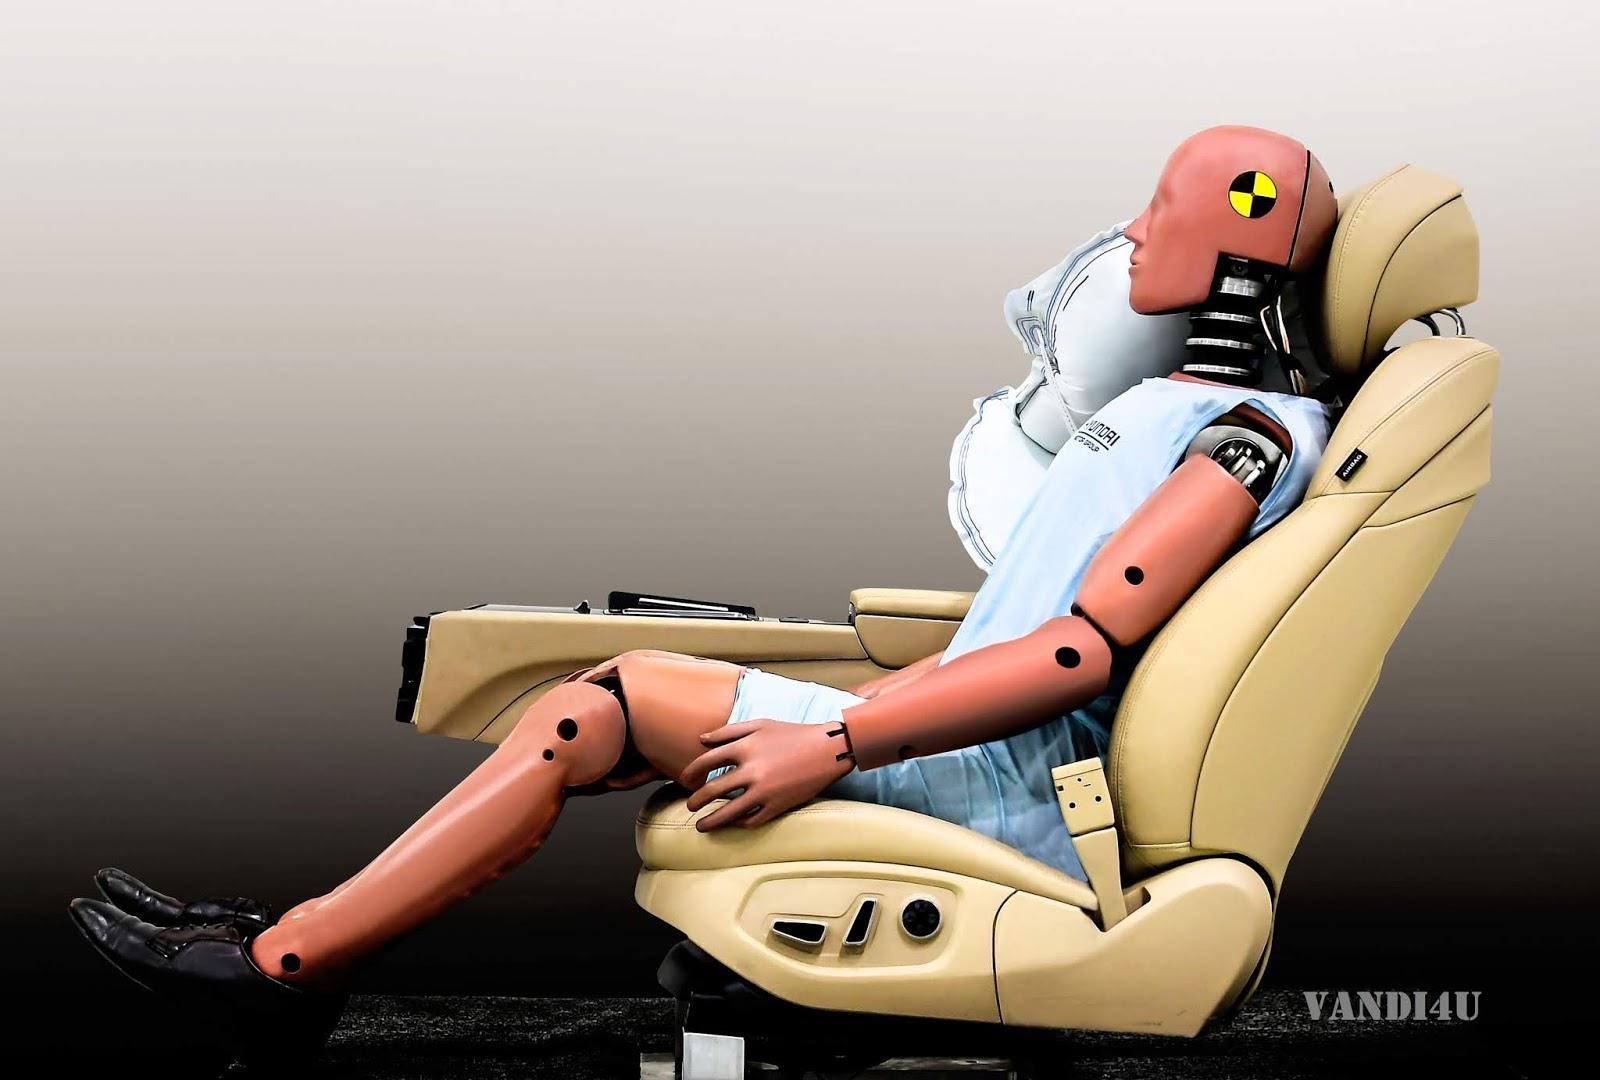 Hyundai Motor Group Develops Center Side Airbag For Cars | VANDI4U